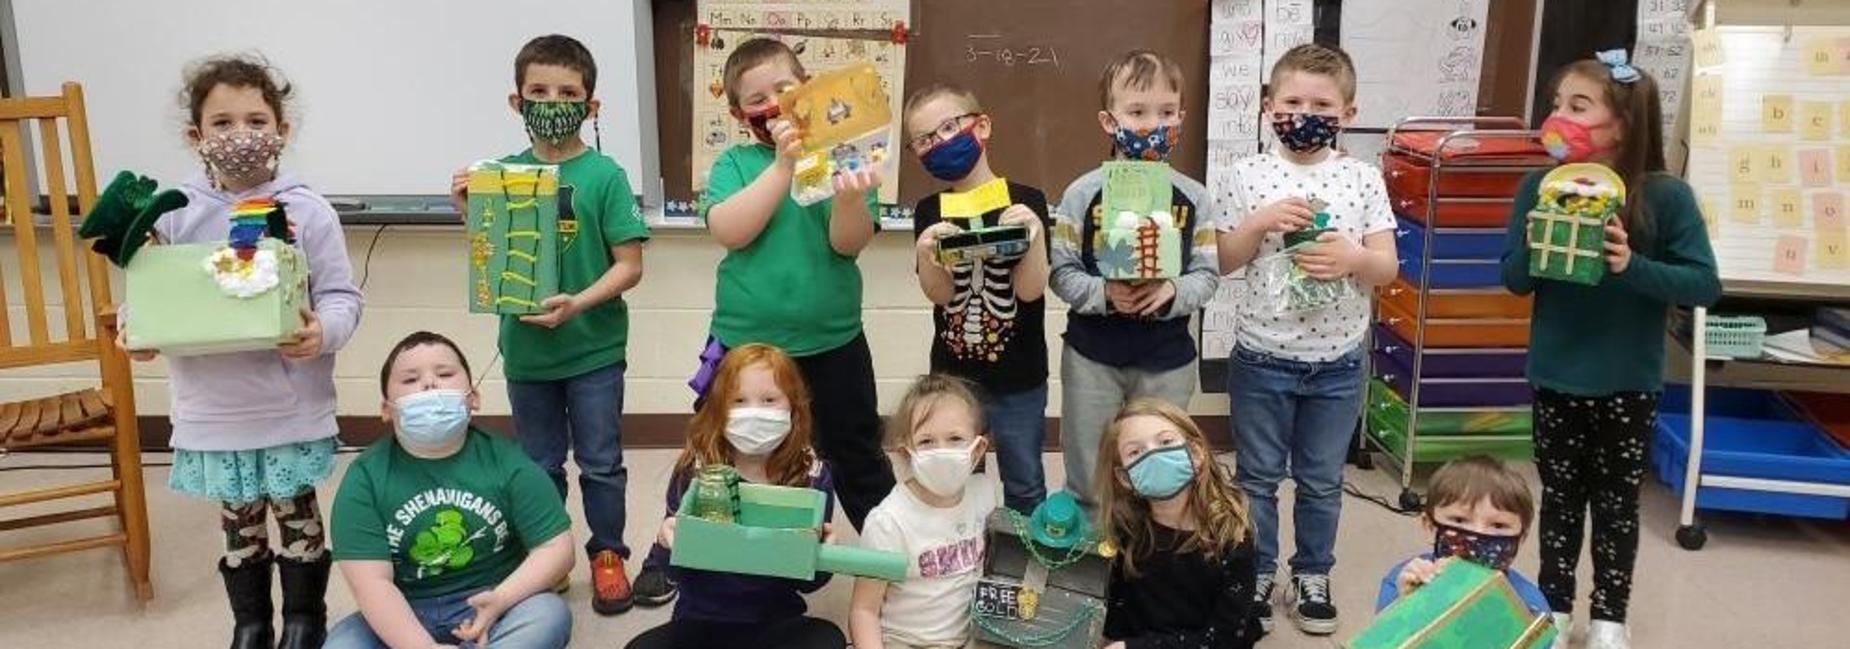 Kindergarten Leprechaun traps